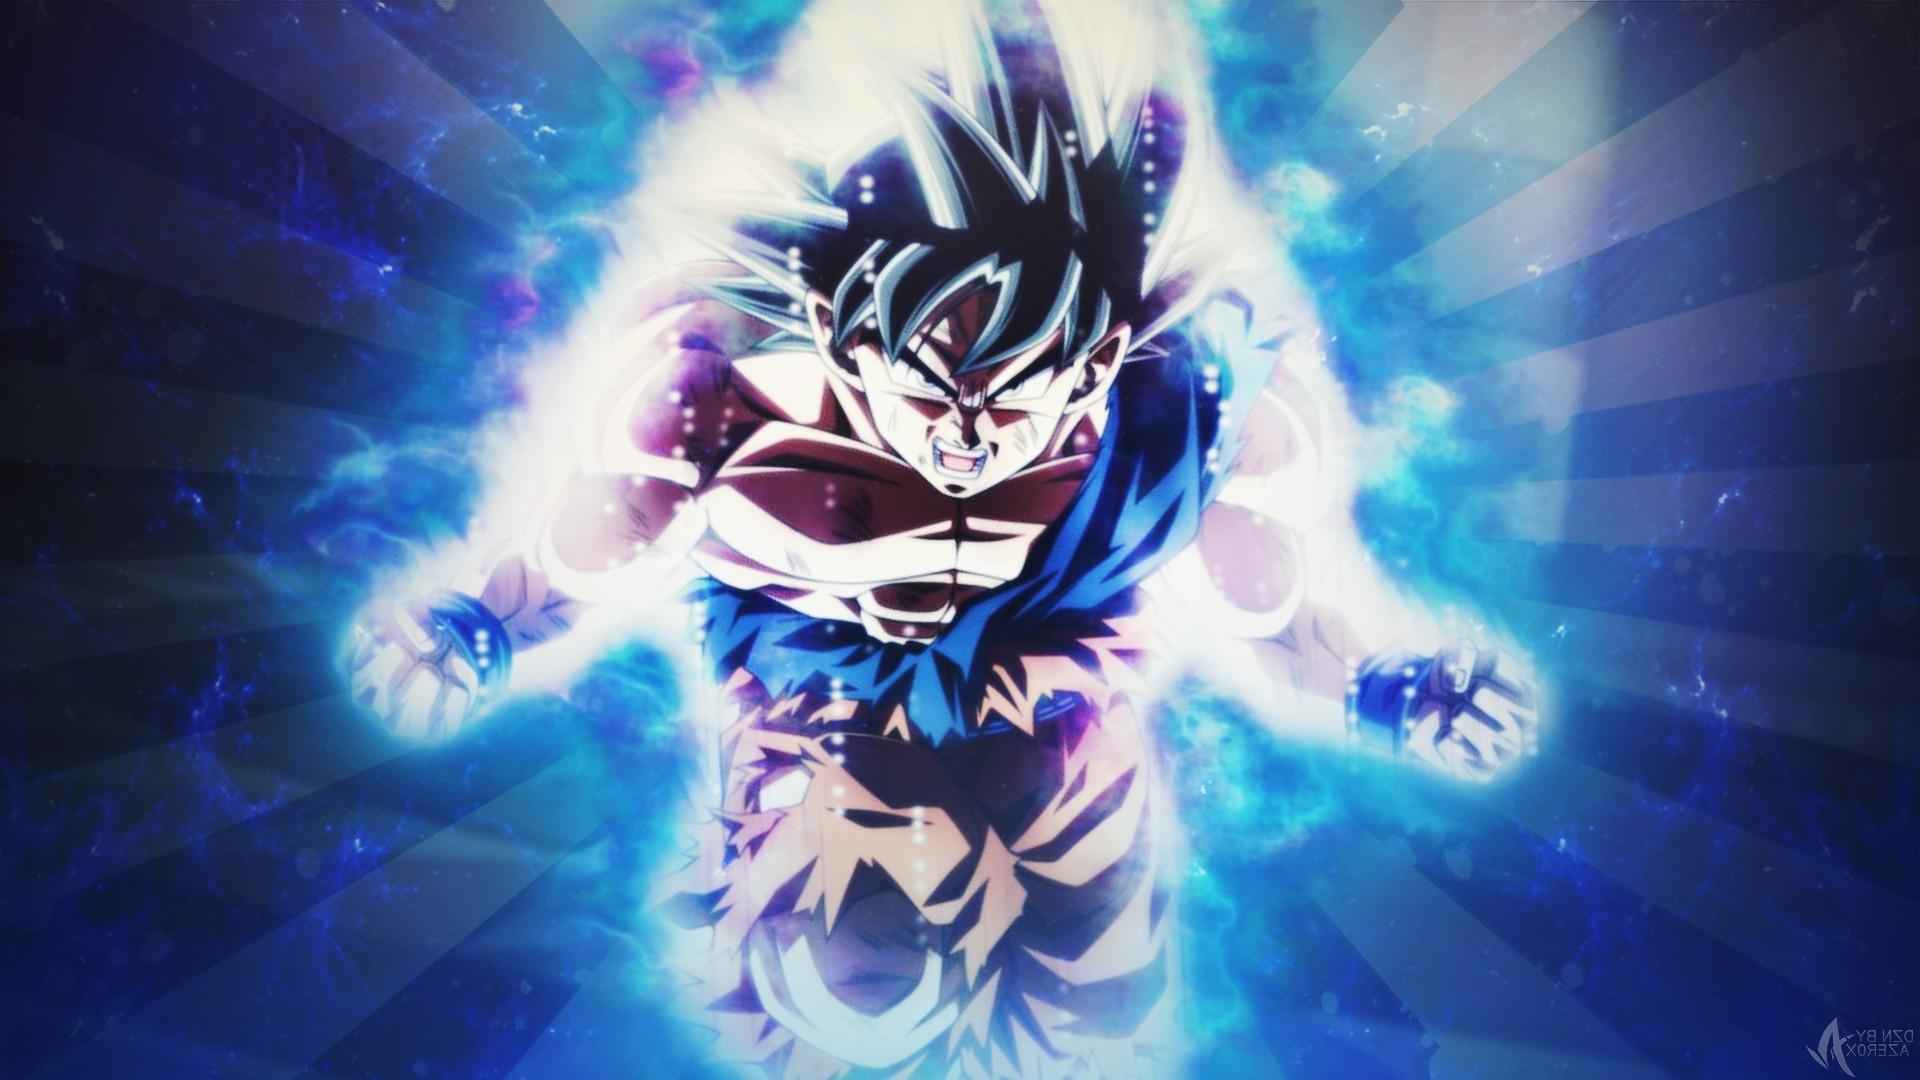 Ultra Instinct Goku Hd Wallpaper: Son Goku Ultra Instinct Wallpaper Iphone Labzada Wallpaper